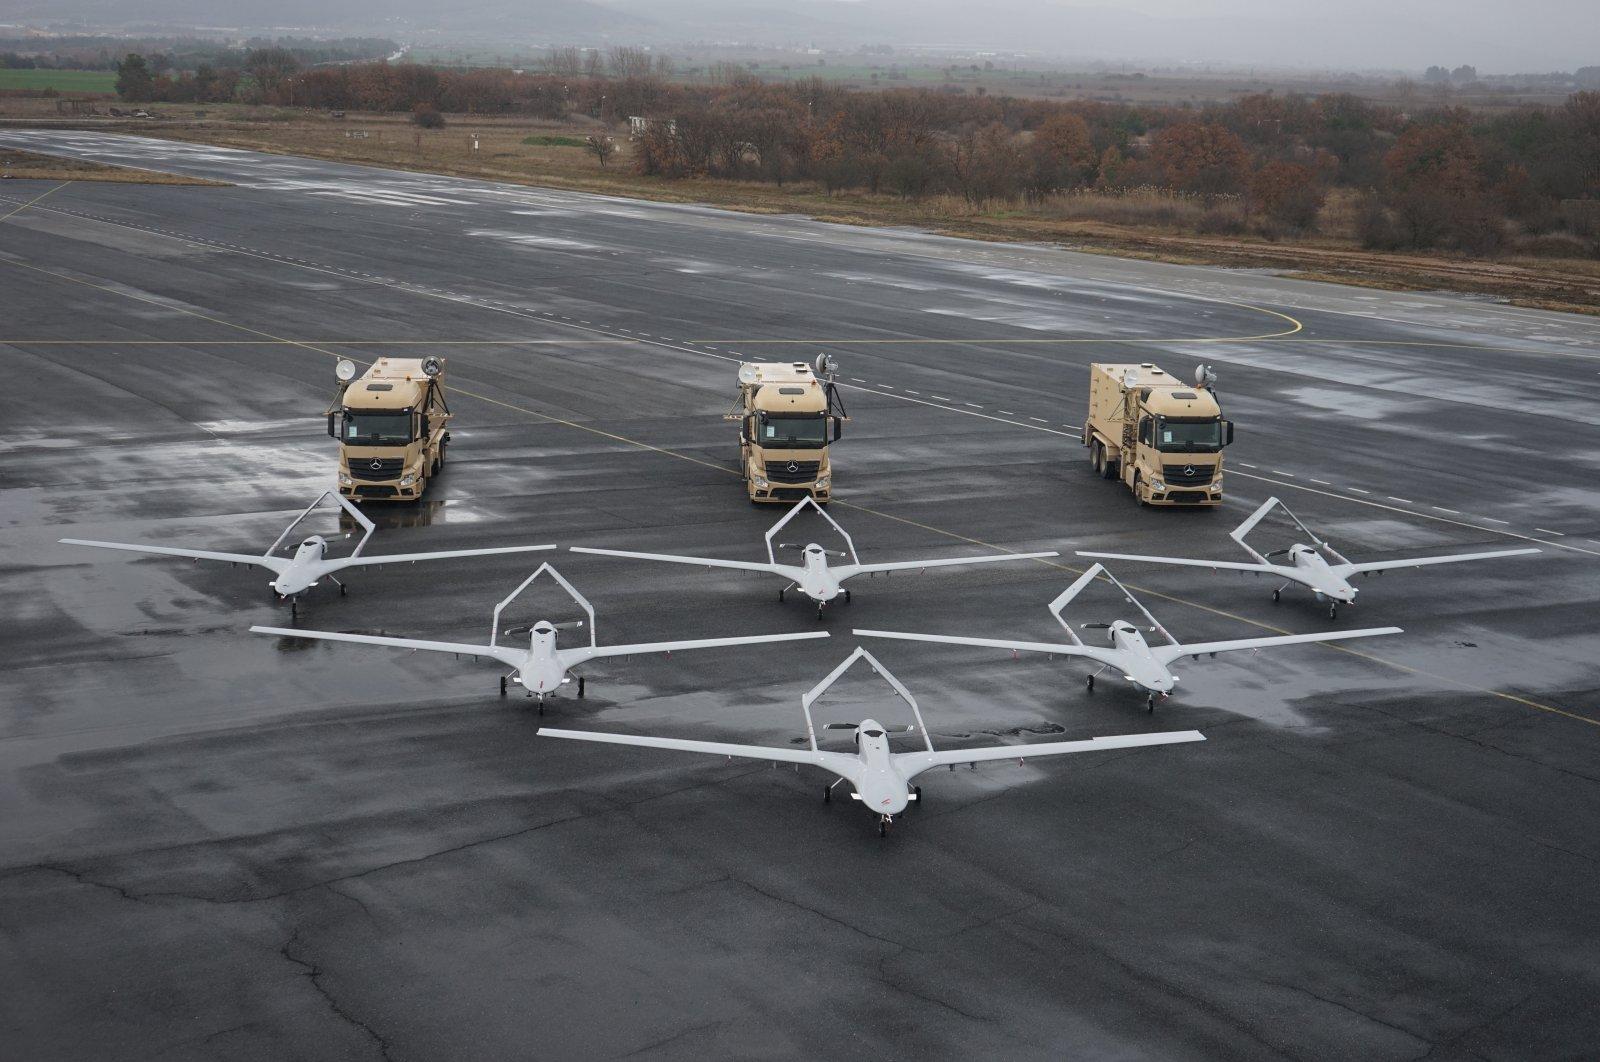 Bayraktar TB2 armed drones in a file photo from Feb. 2, 2019. (Photo by Baykar Makina via AA)